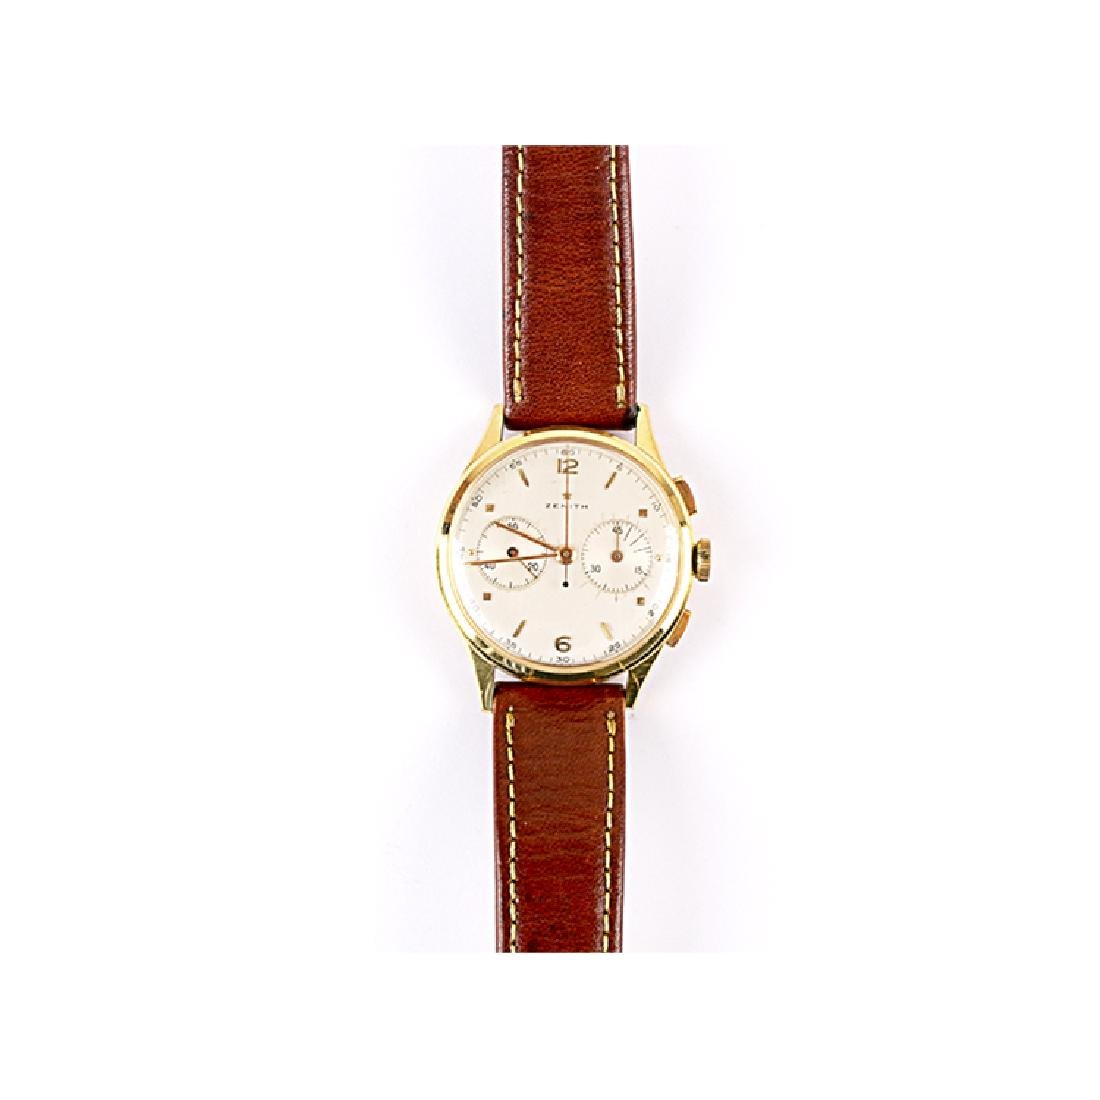 ZENITH gold chronograph watch